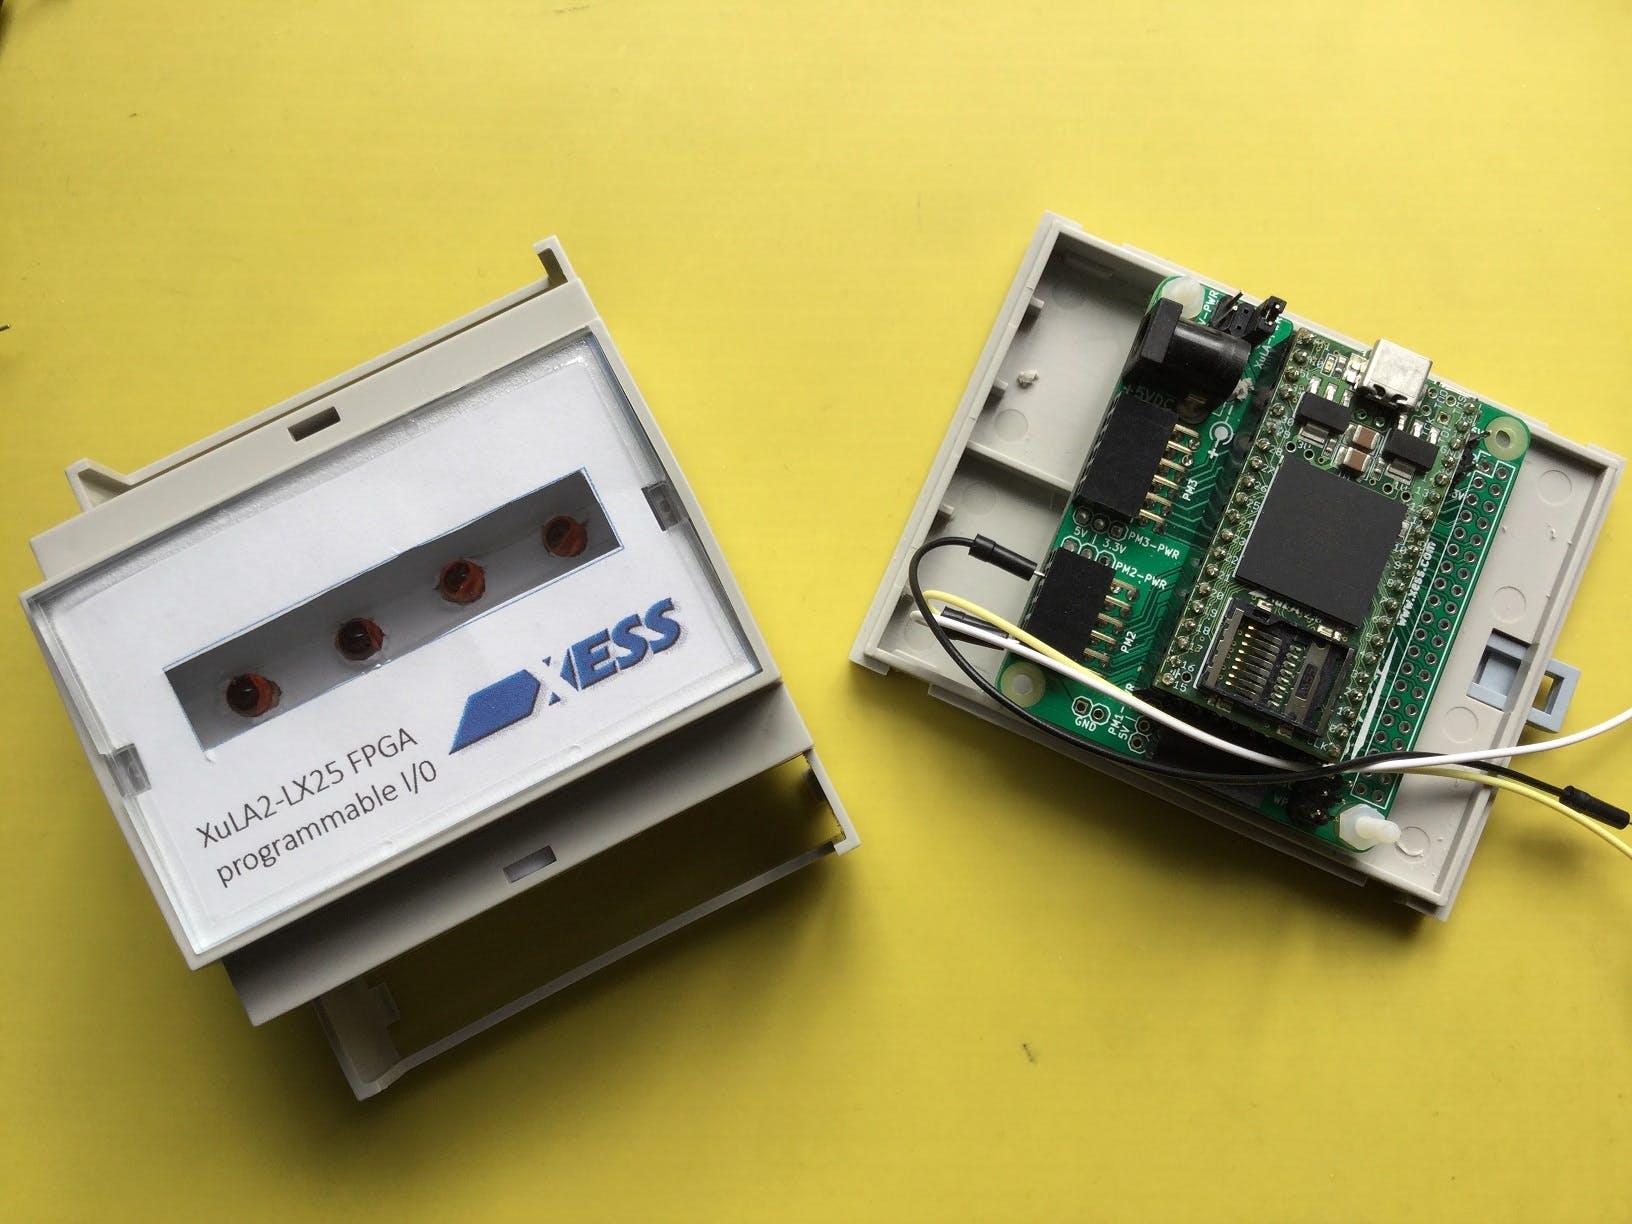 Xess XuLA2-LX25 FPGA in Velleman 2 Unit Housing